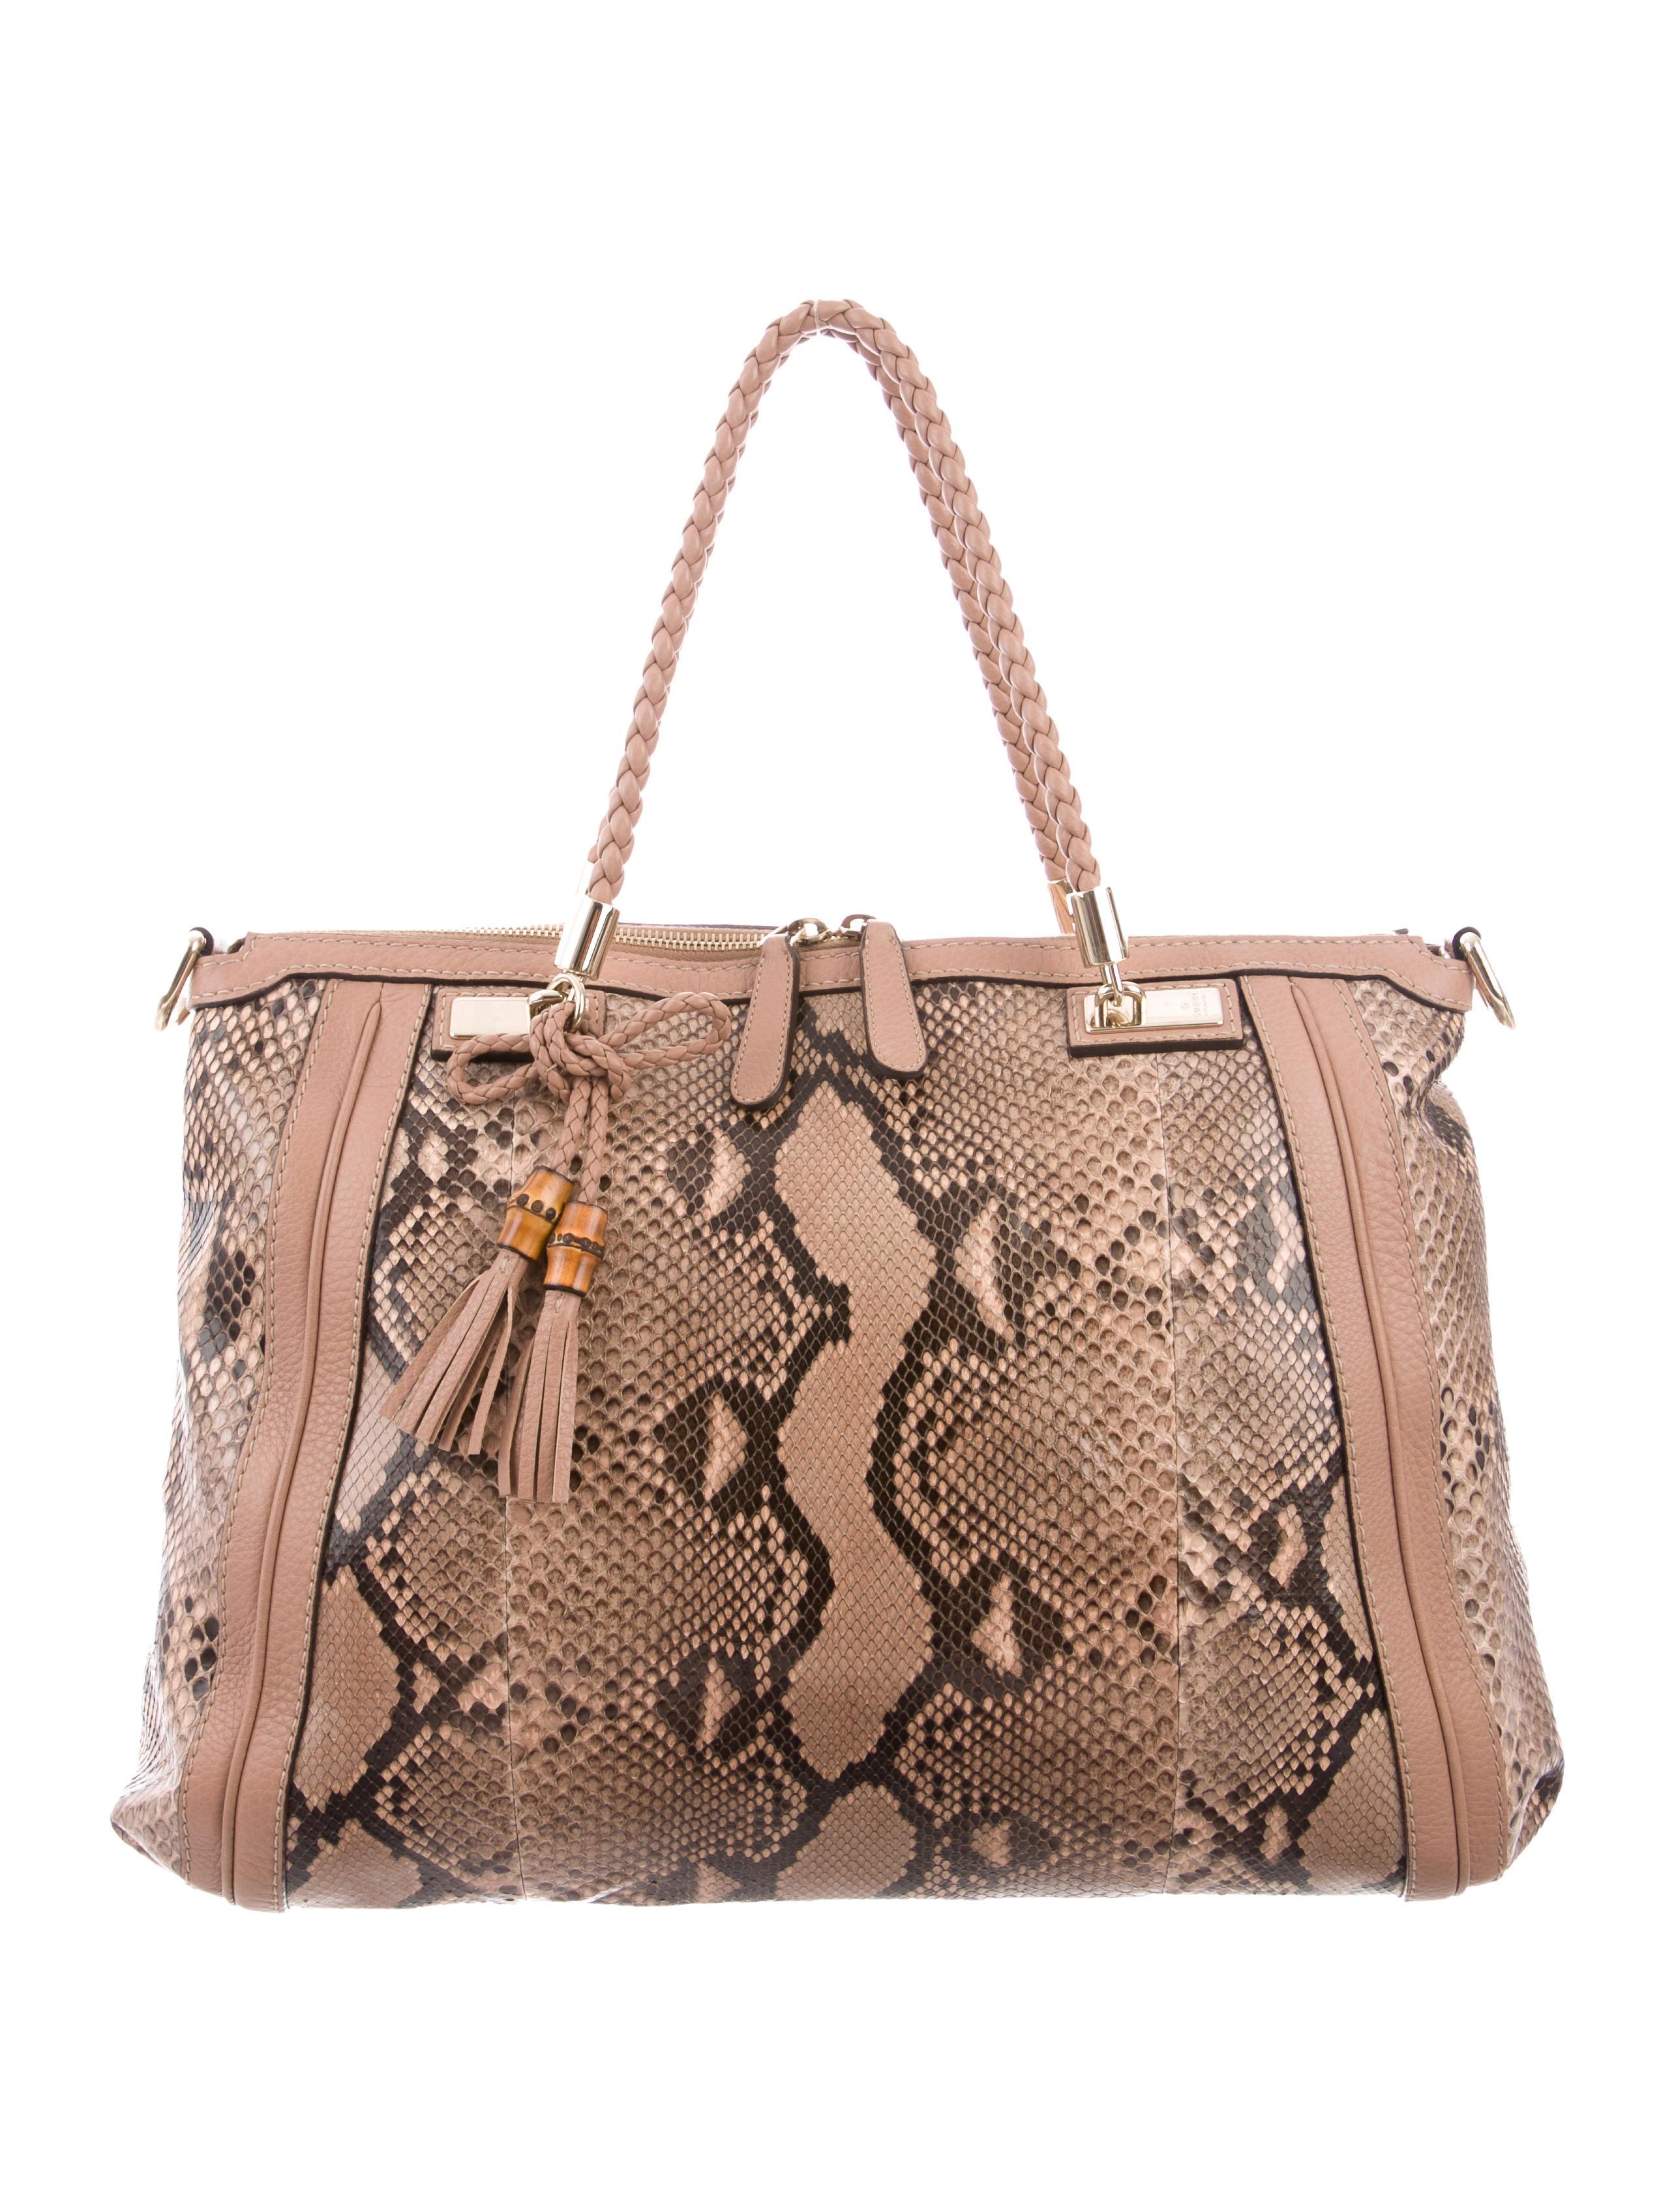 abf6b0f0b3c Gucci Python Bella Top Handle Bag - Handbags - GUC217920